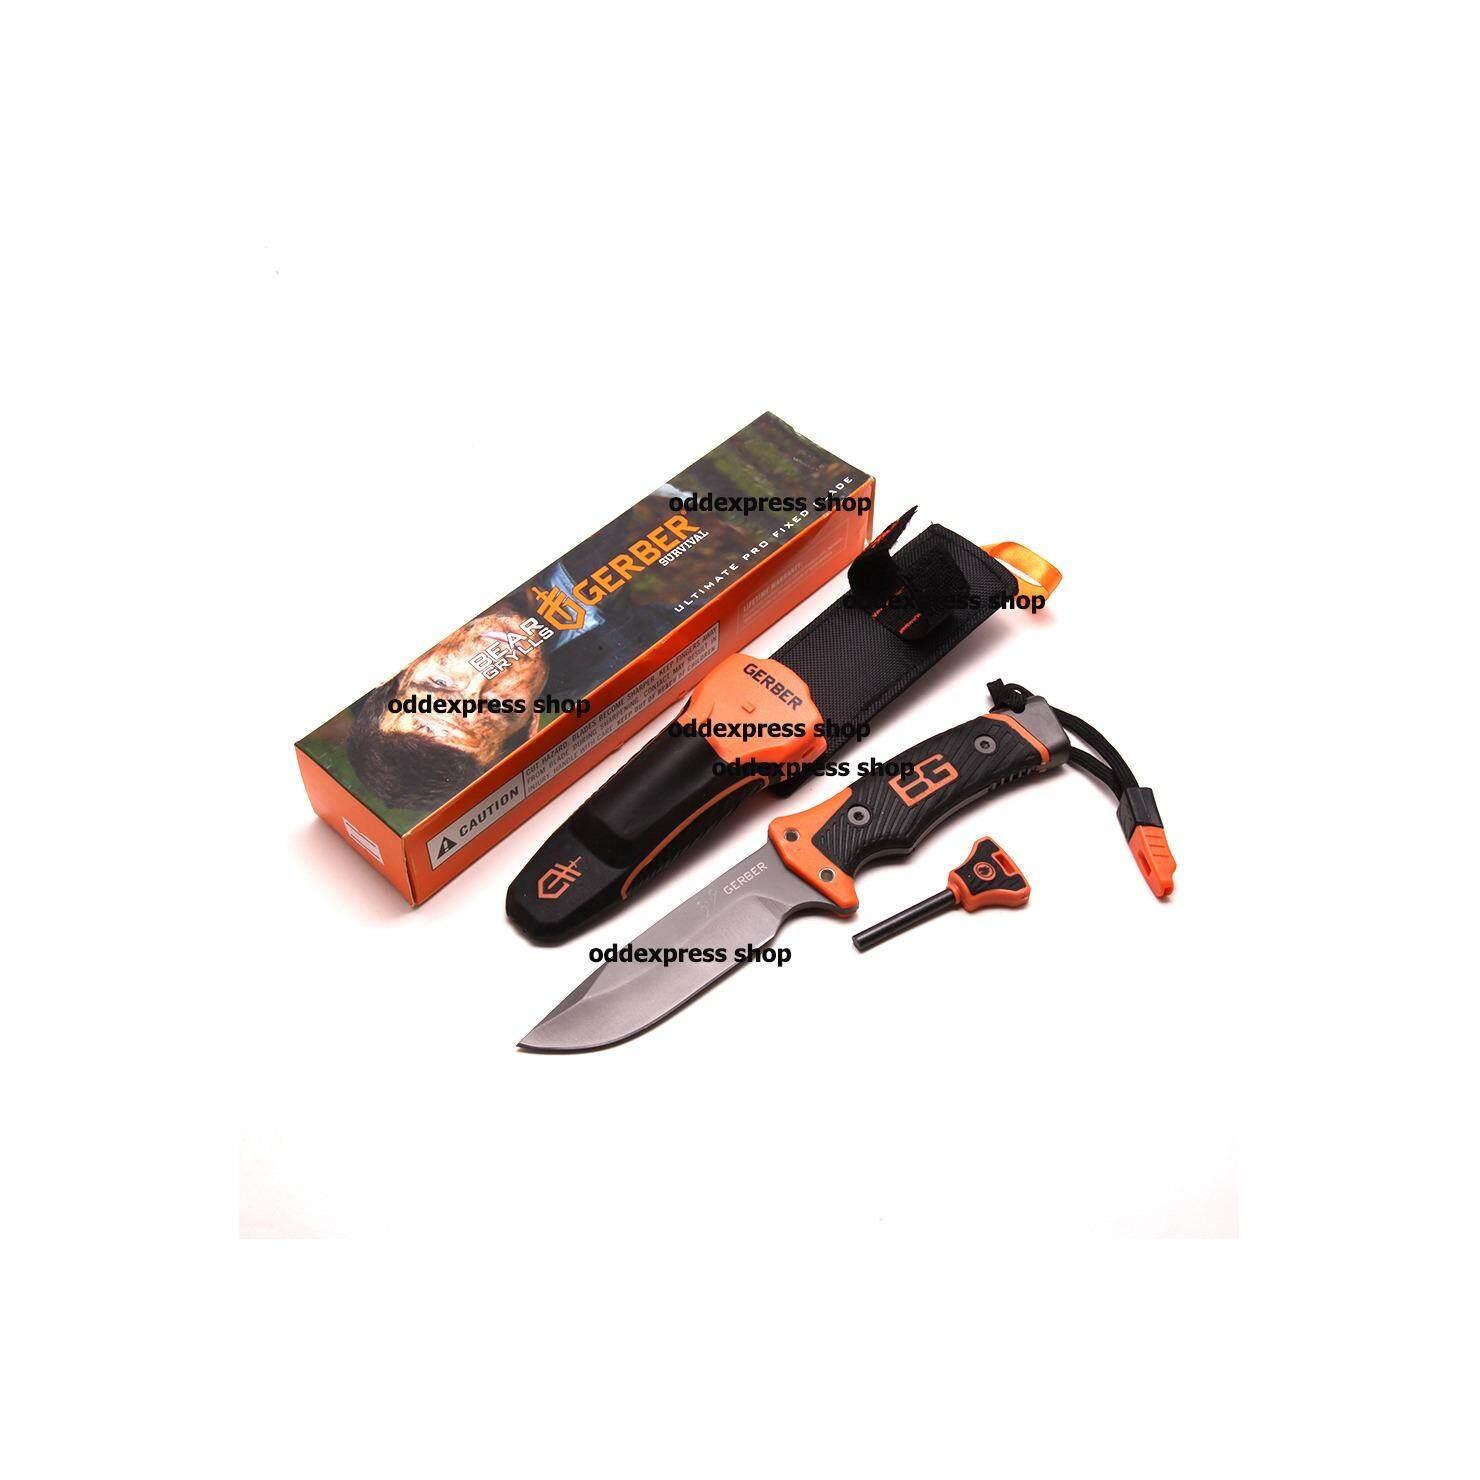 100 Gerber Bear Grylls Ultimate Pro Fixed Blade มีดพก ใบมีดพับไม่ได้ยาว 10 นิ้ว Unbranded Generic ถูก ใน กรุงเทพมหานคร